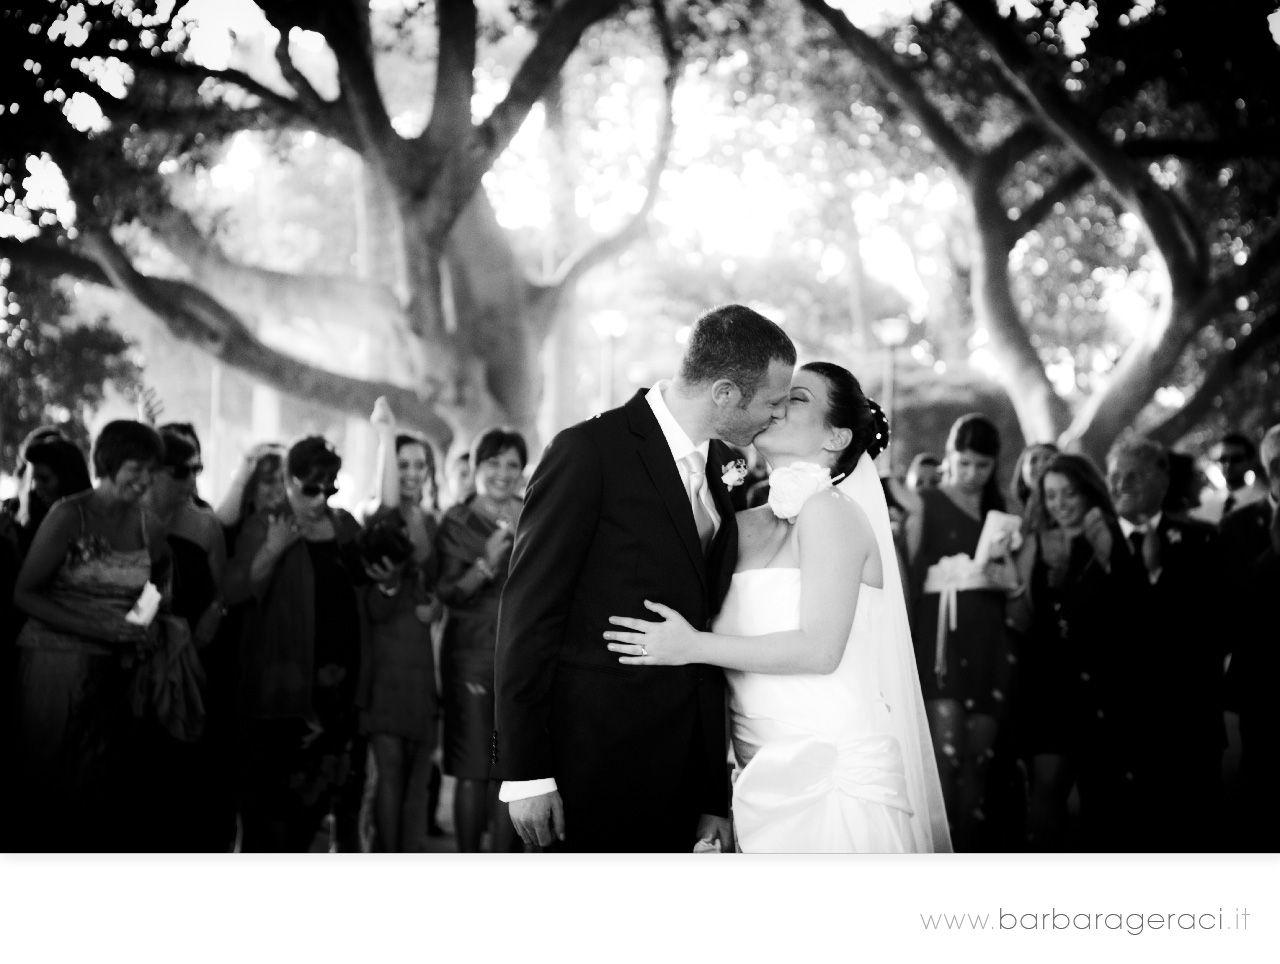 www.barbarageraci.it wedding kiss